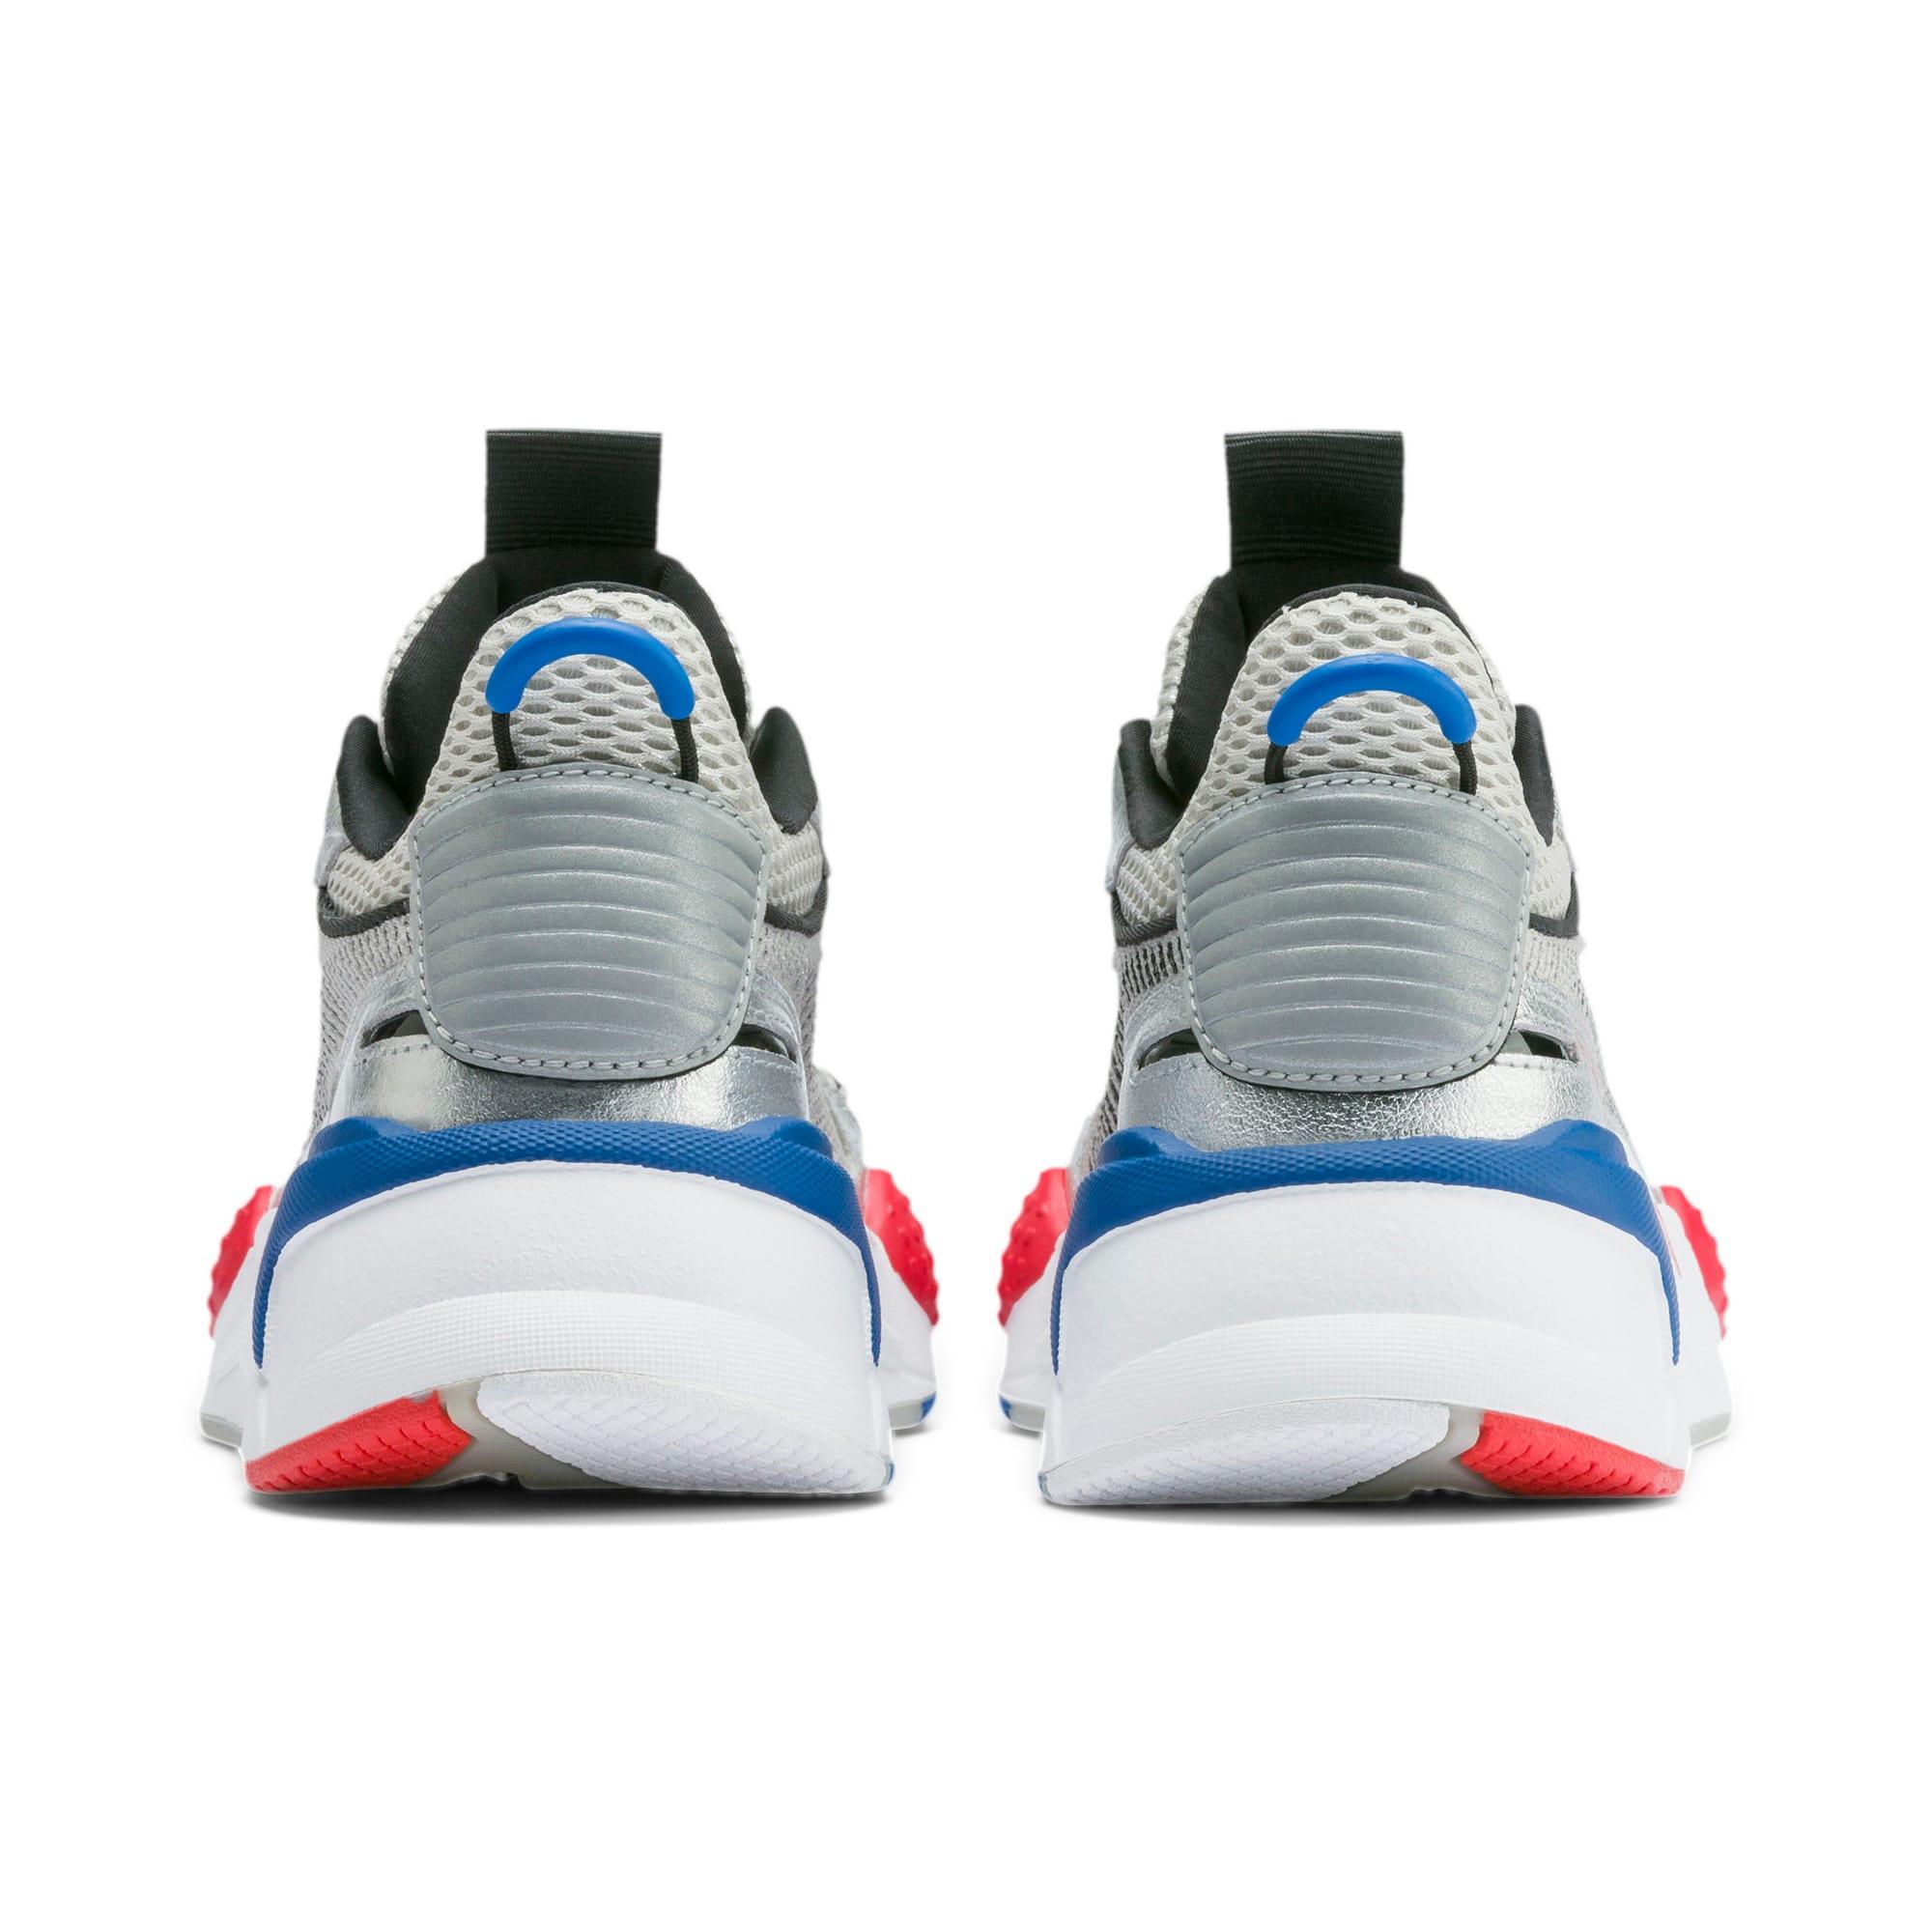 Thumbnail 3 of RS-X Space Agency Sneakers JR, Puma Silver-Gray Violet, medium